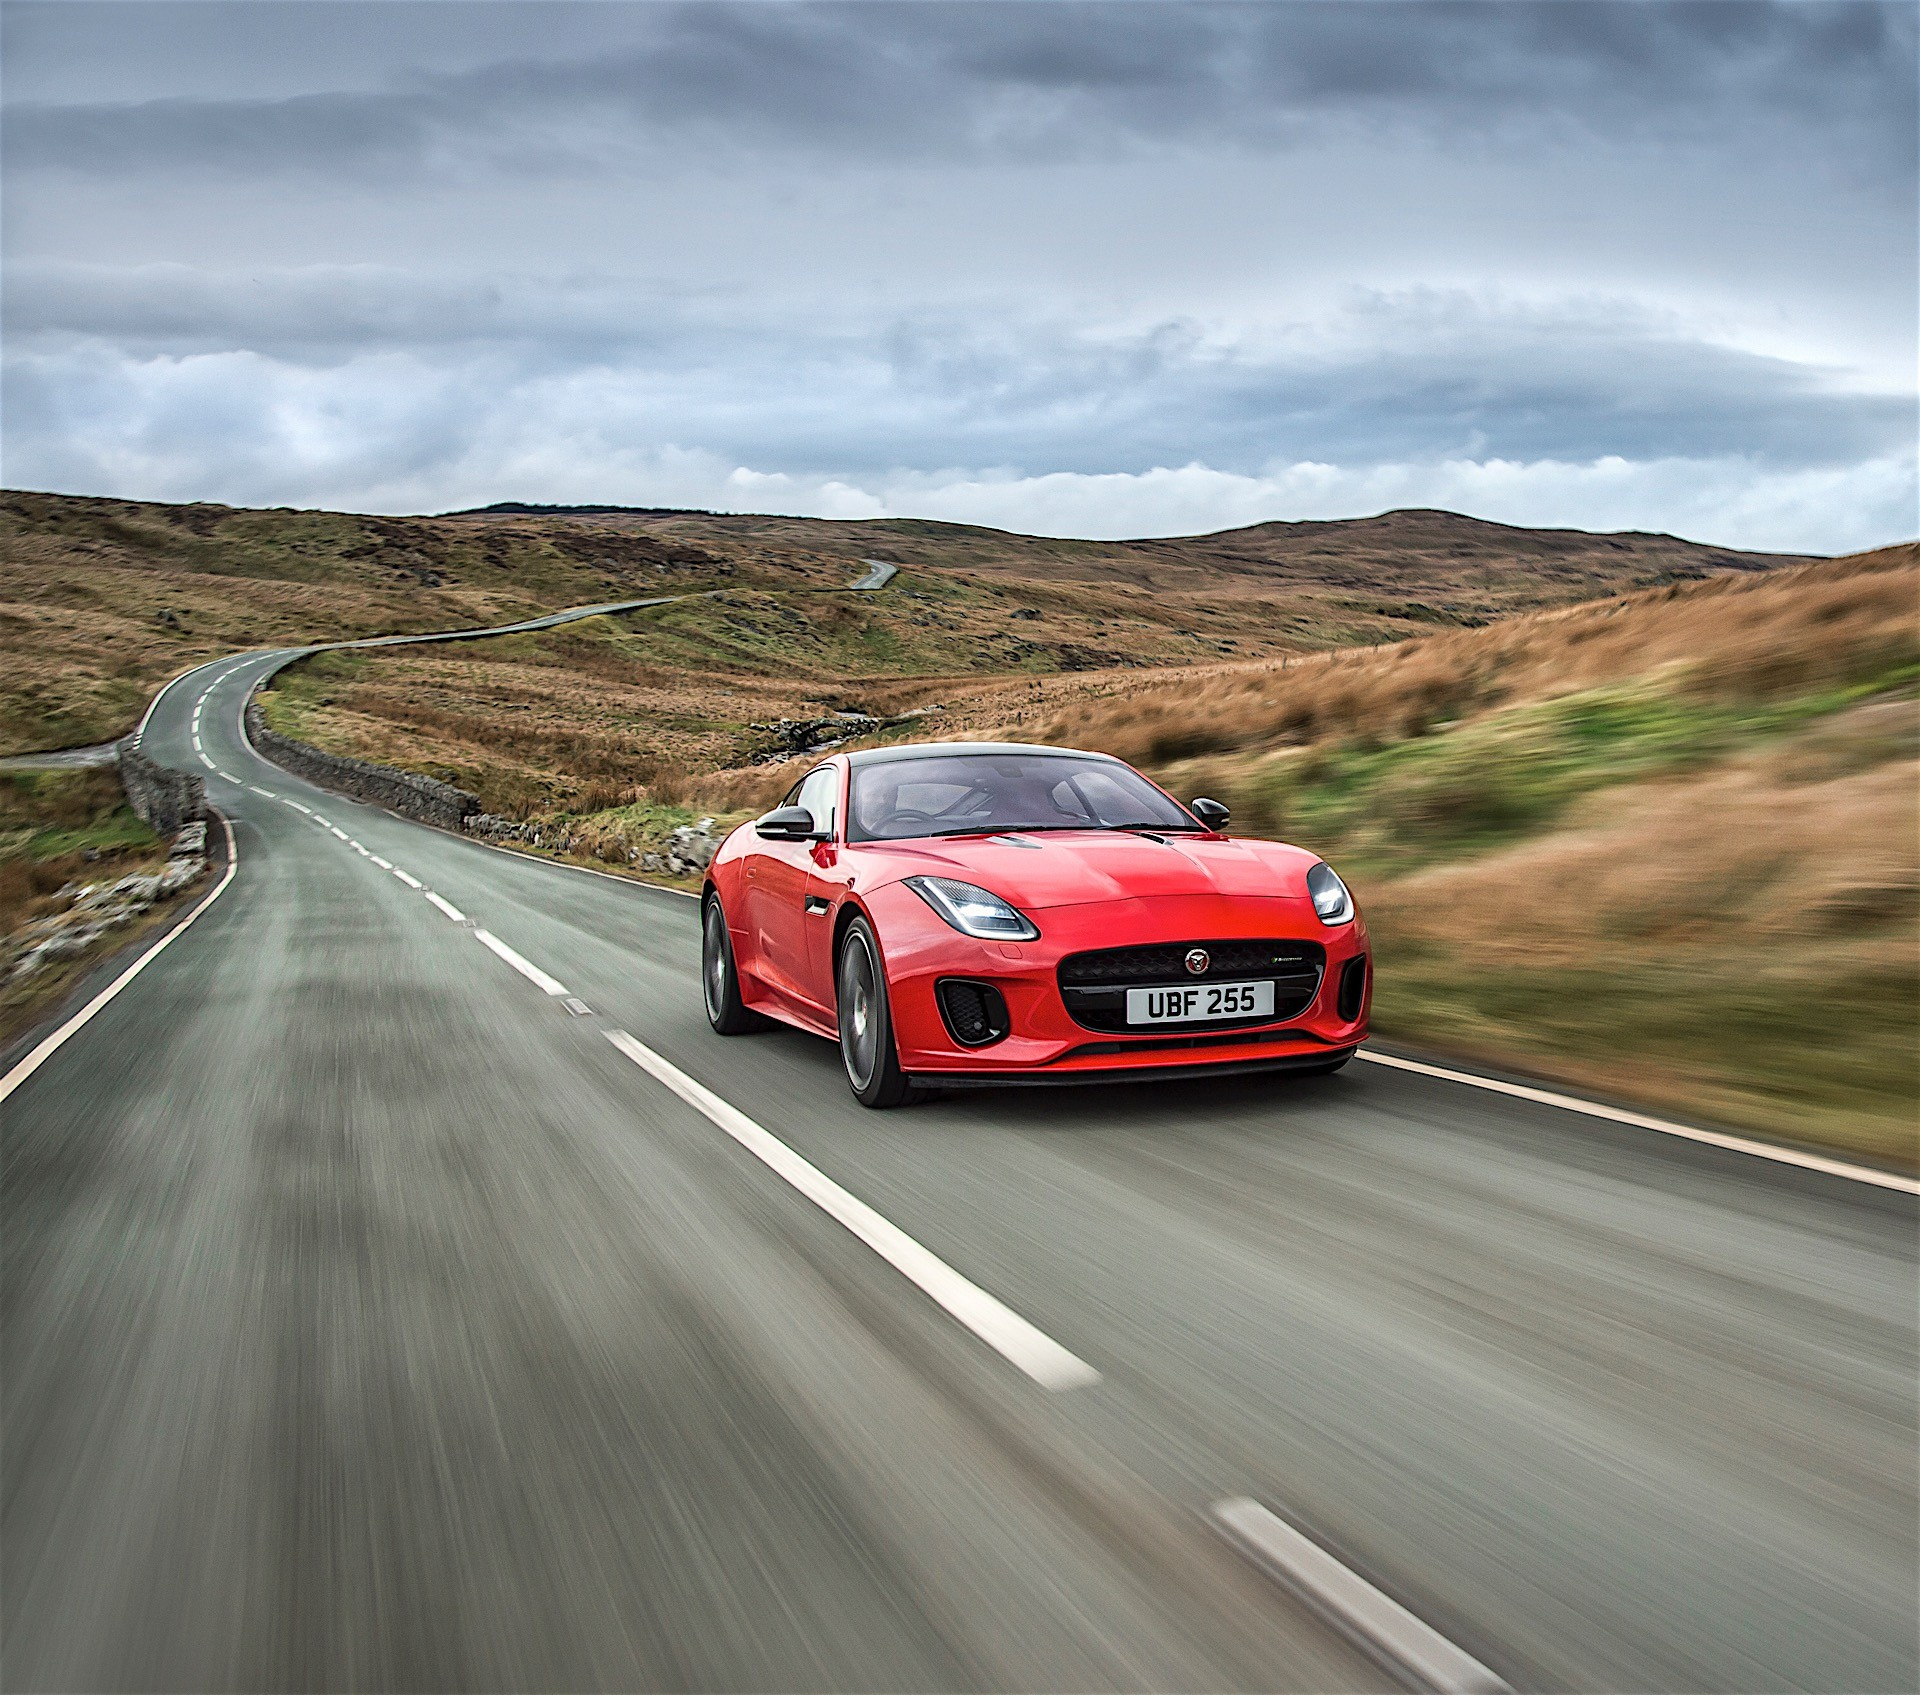 The New Jaguar: Jaguar F-Type Gets A Four Cylinder Engine With 300 HP